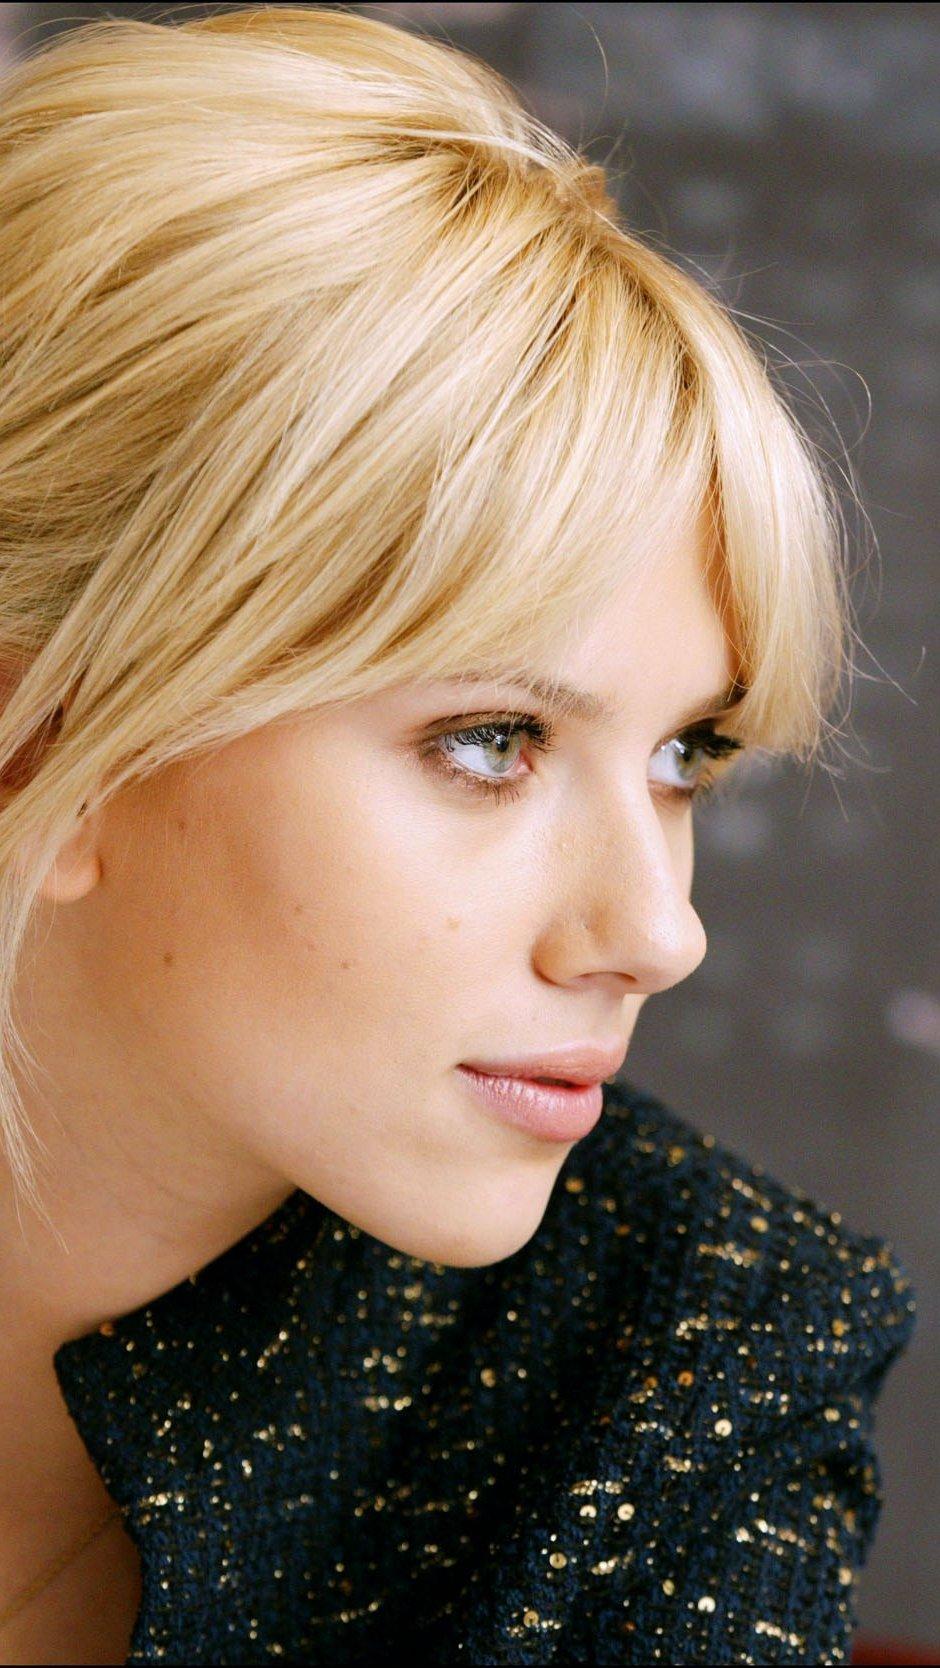 Wallpaper Scarlett Johansson Vertical